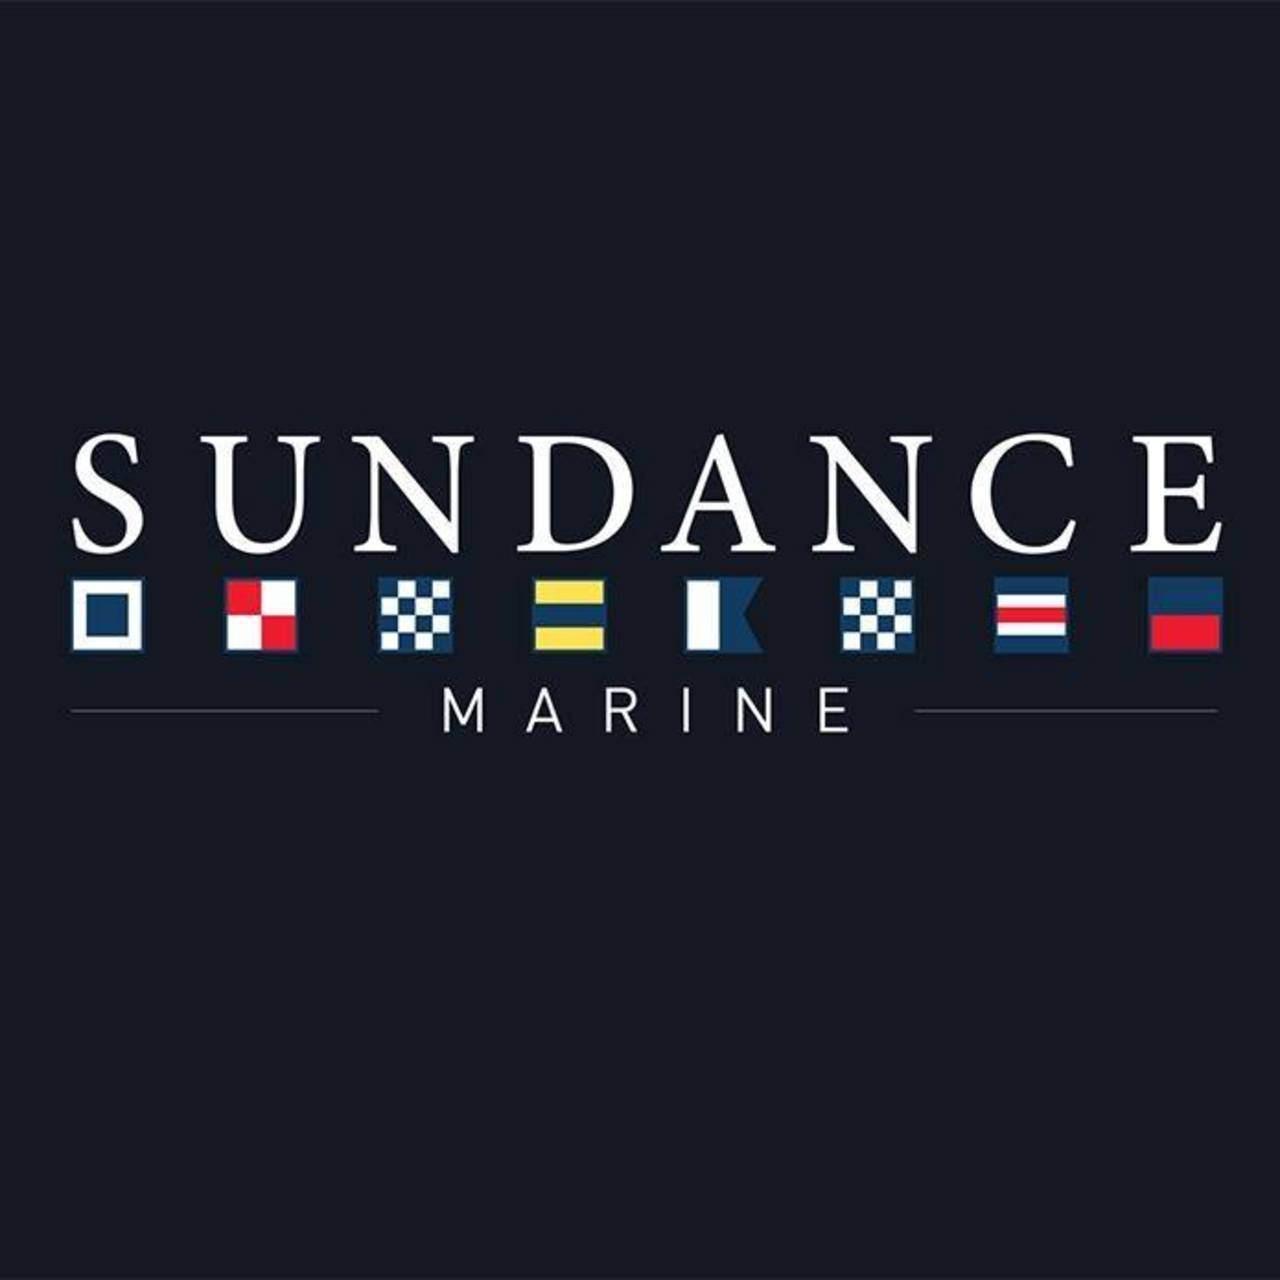 SUNDANCE MARINE SANDRINGHAM OFFICE